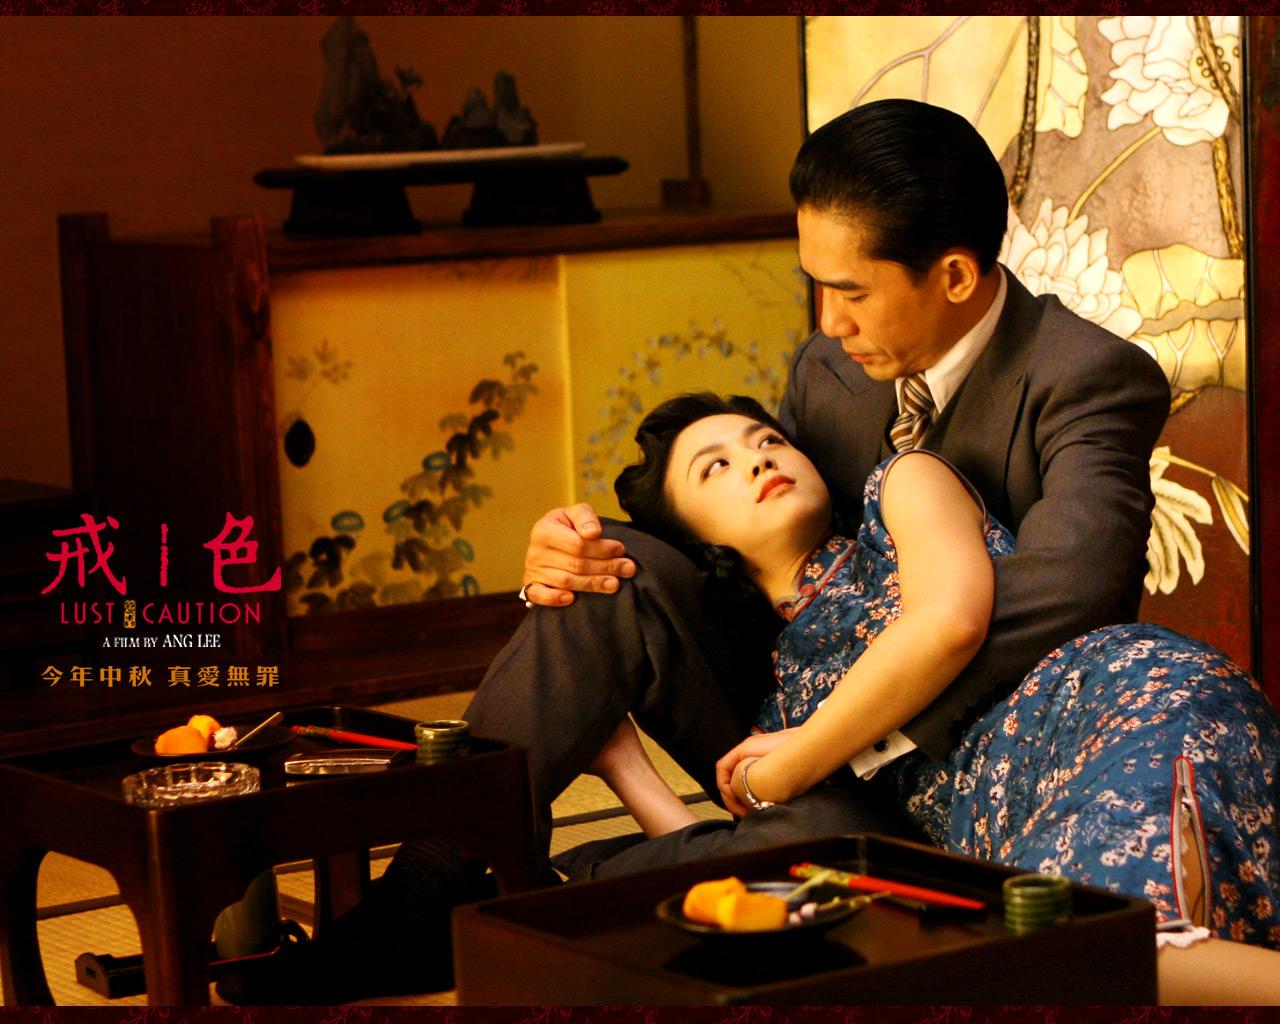 Lust-Caution-色戒-李安電影-上海-張愛玲-取景